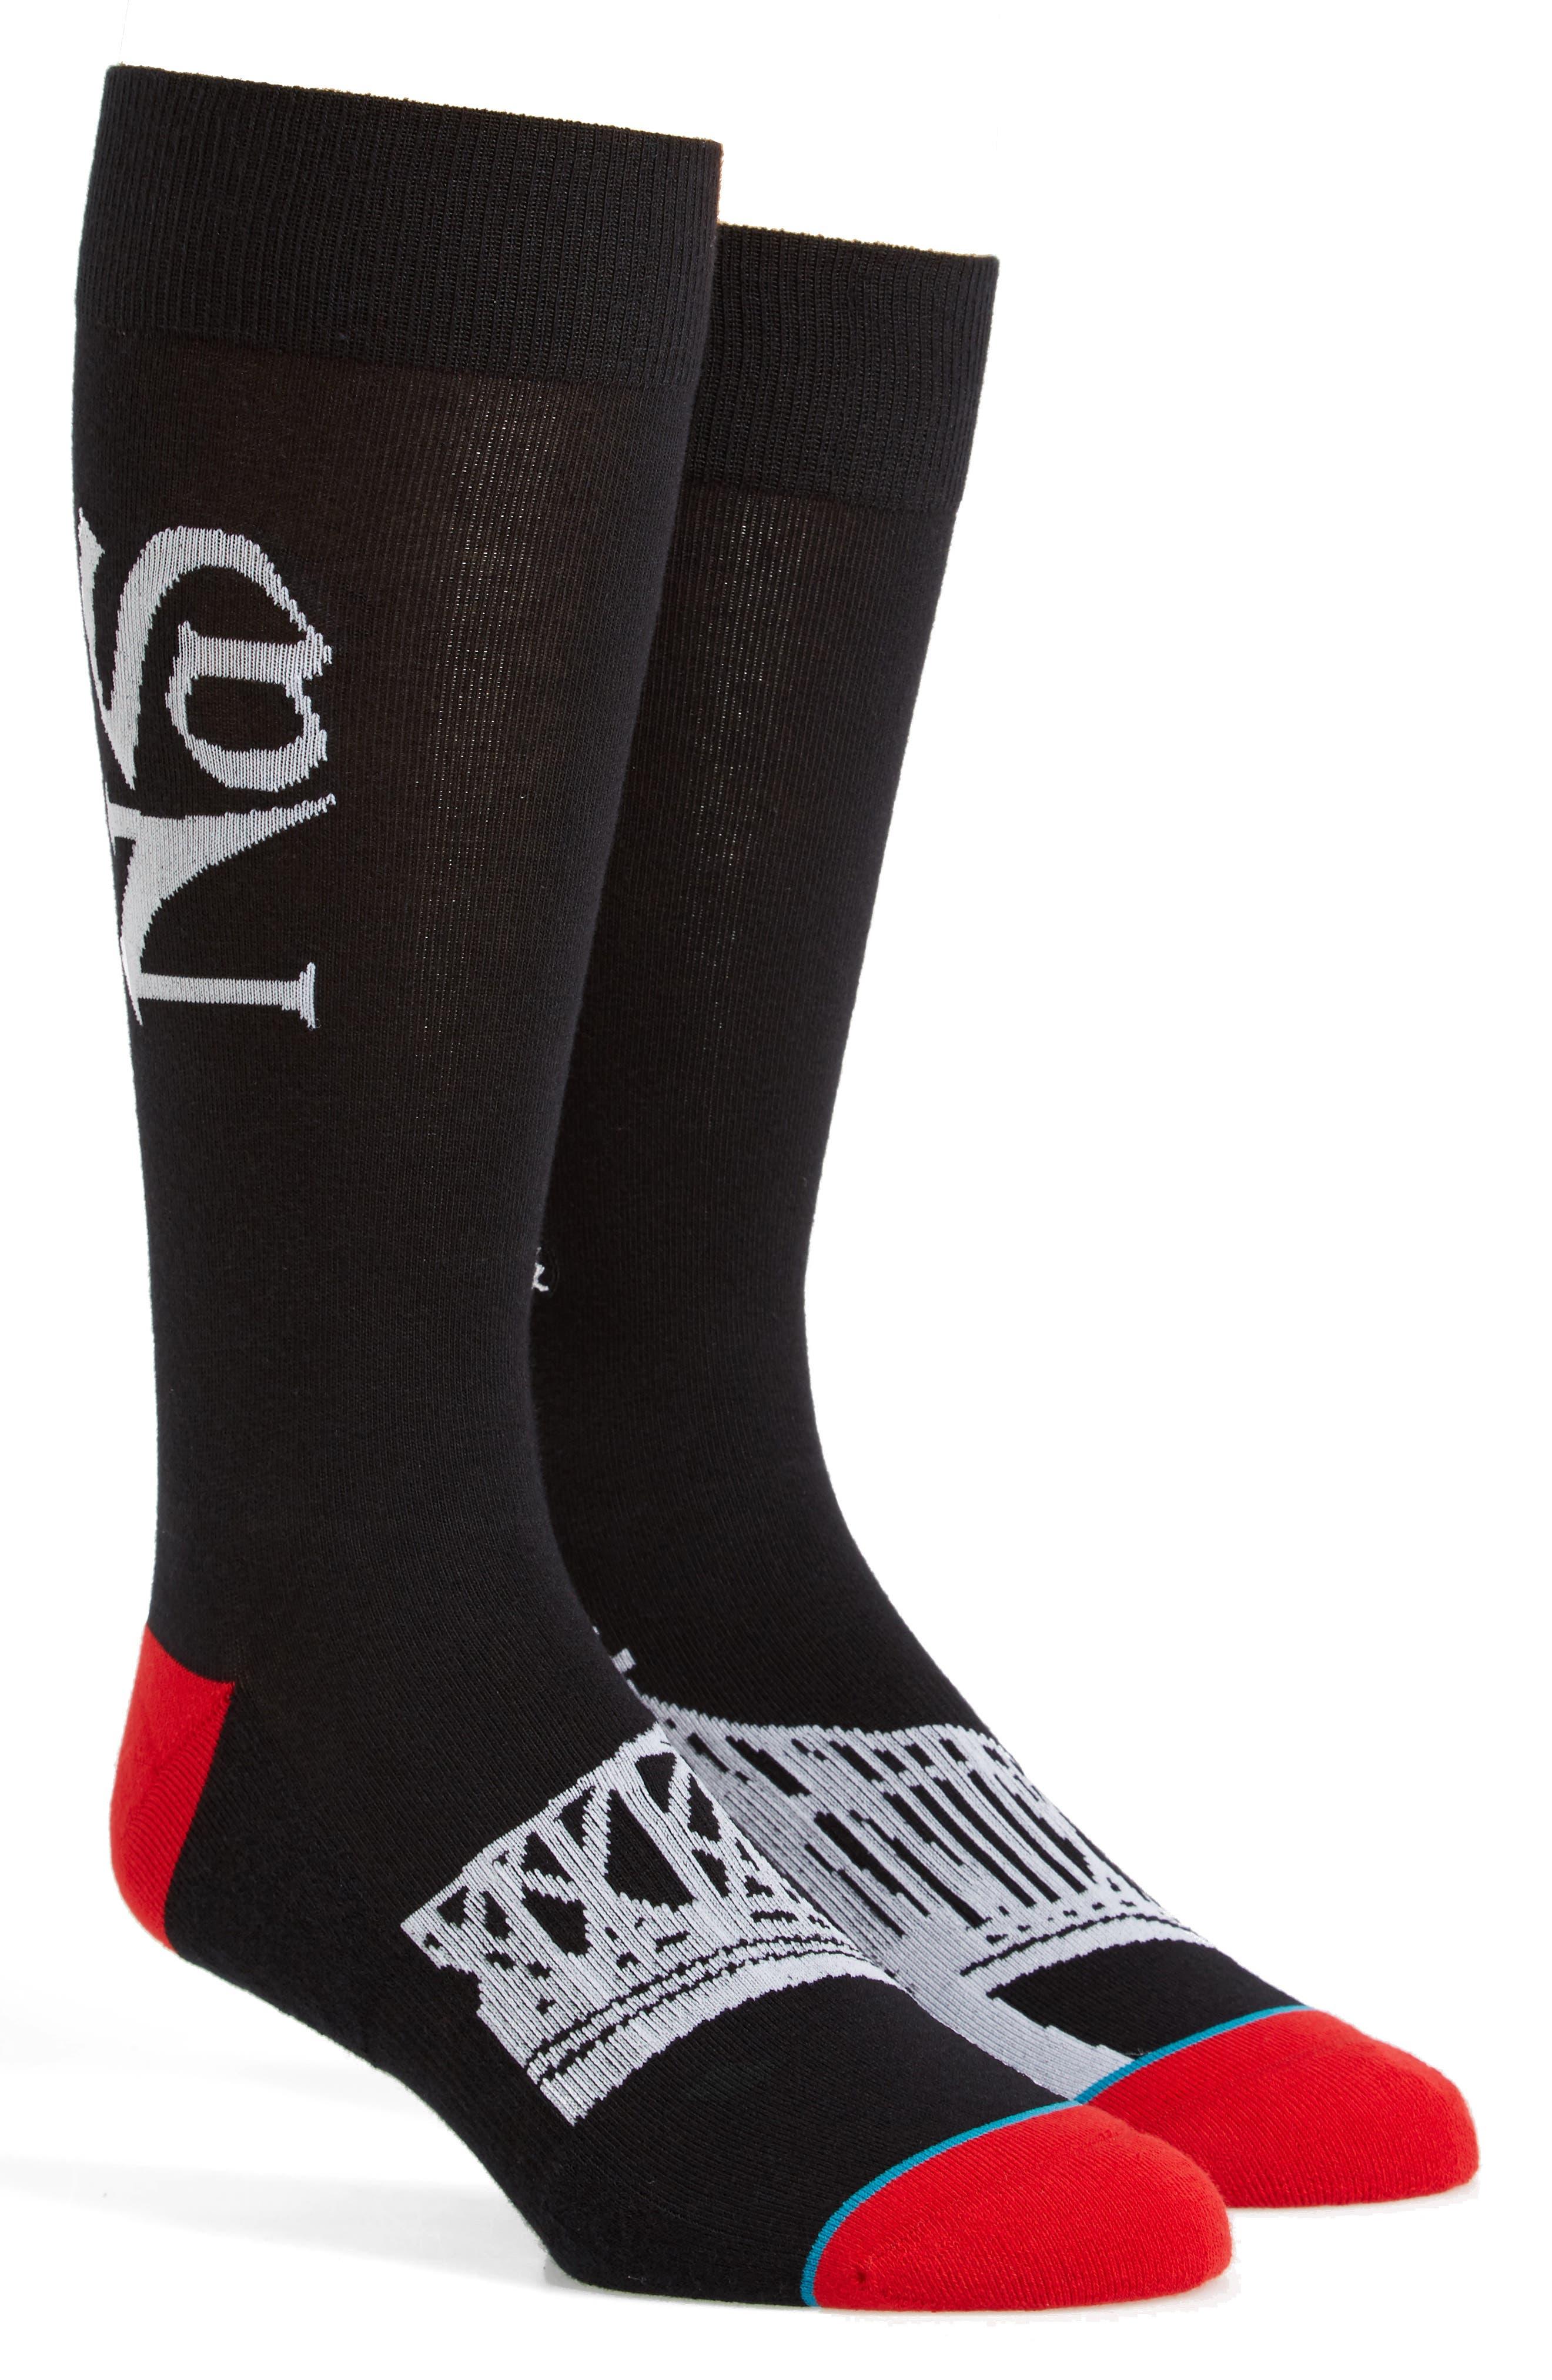 Alternate Image 1 Selected - Stance Illmatic Crew Socks